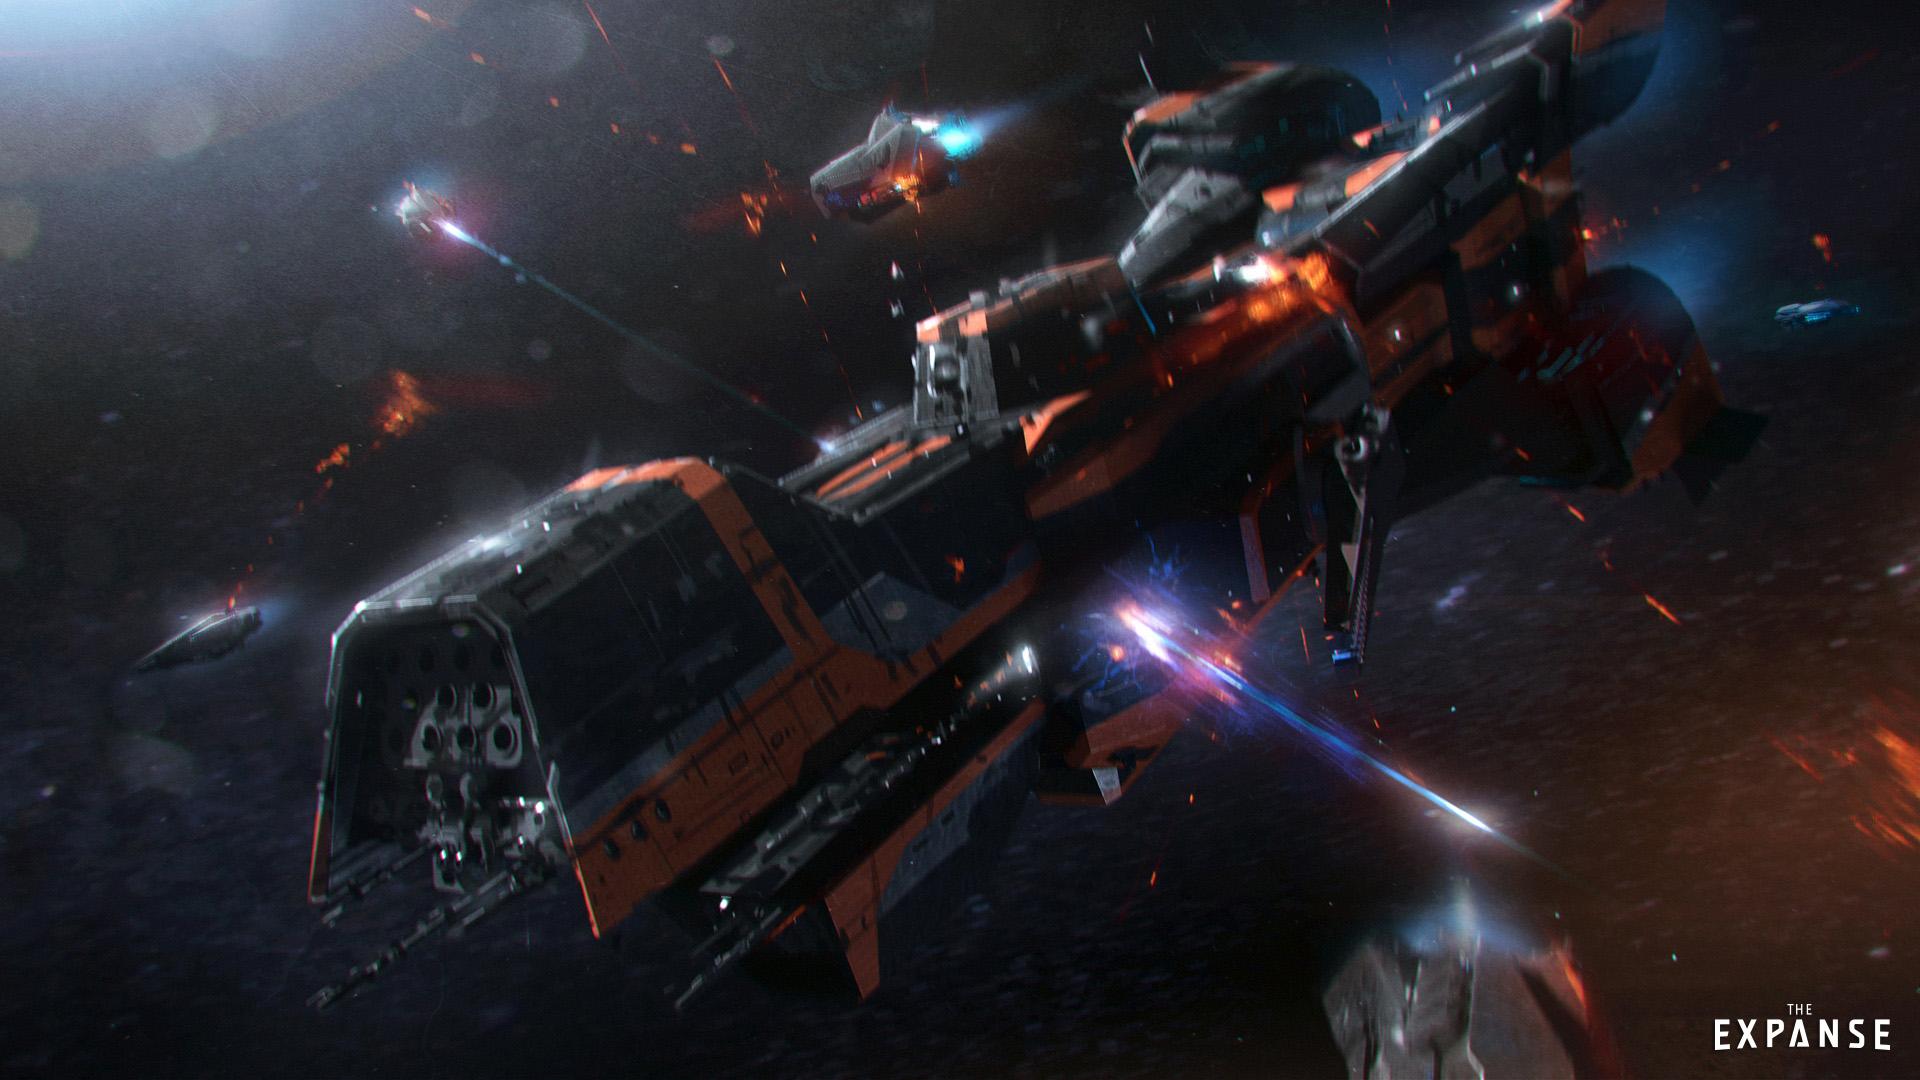 Usoda vesoljske ladje Donnager v seriji Prostranstvo (The Expanse)